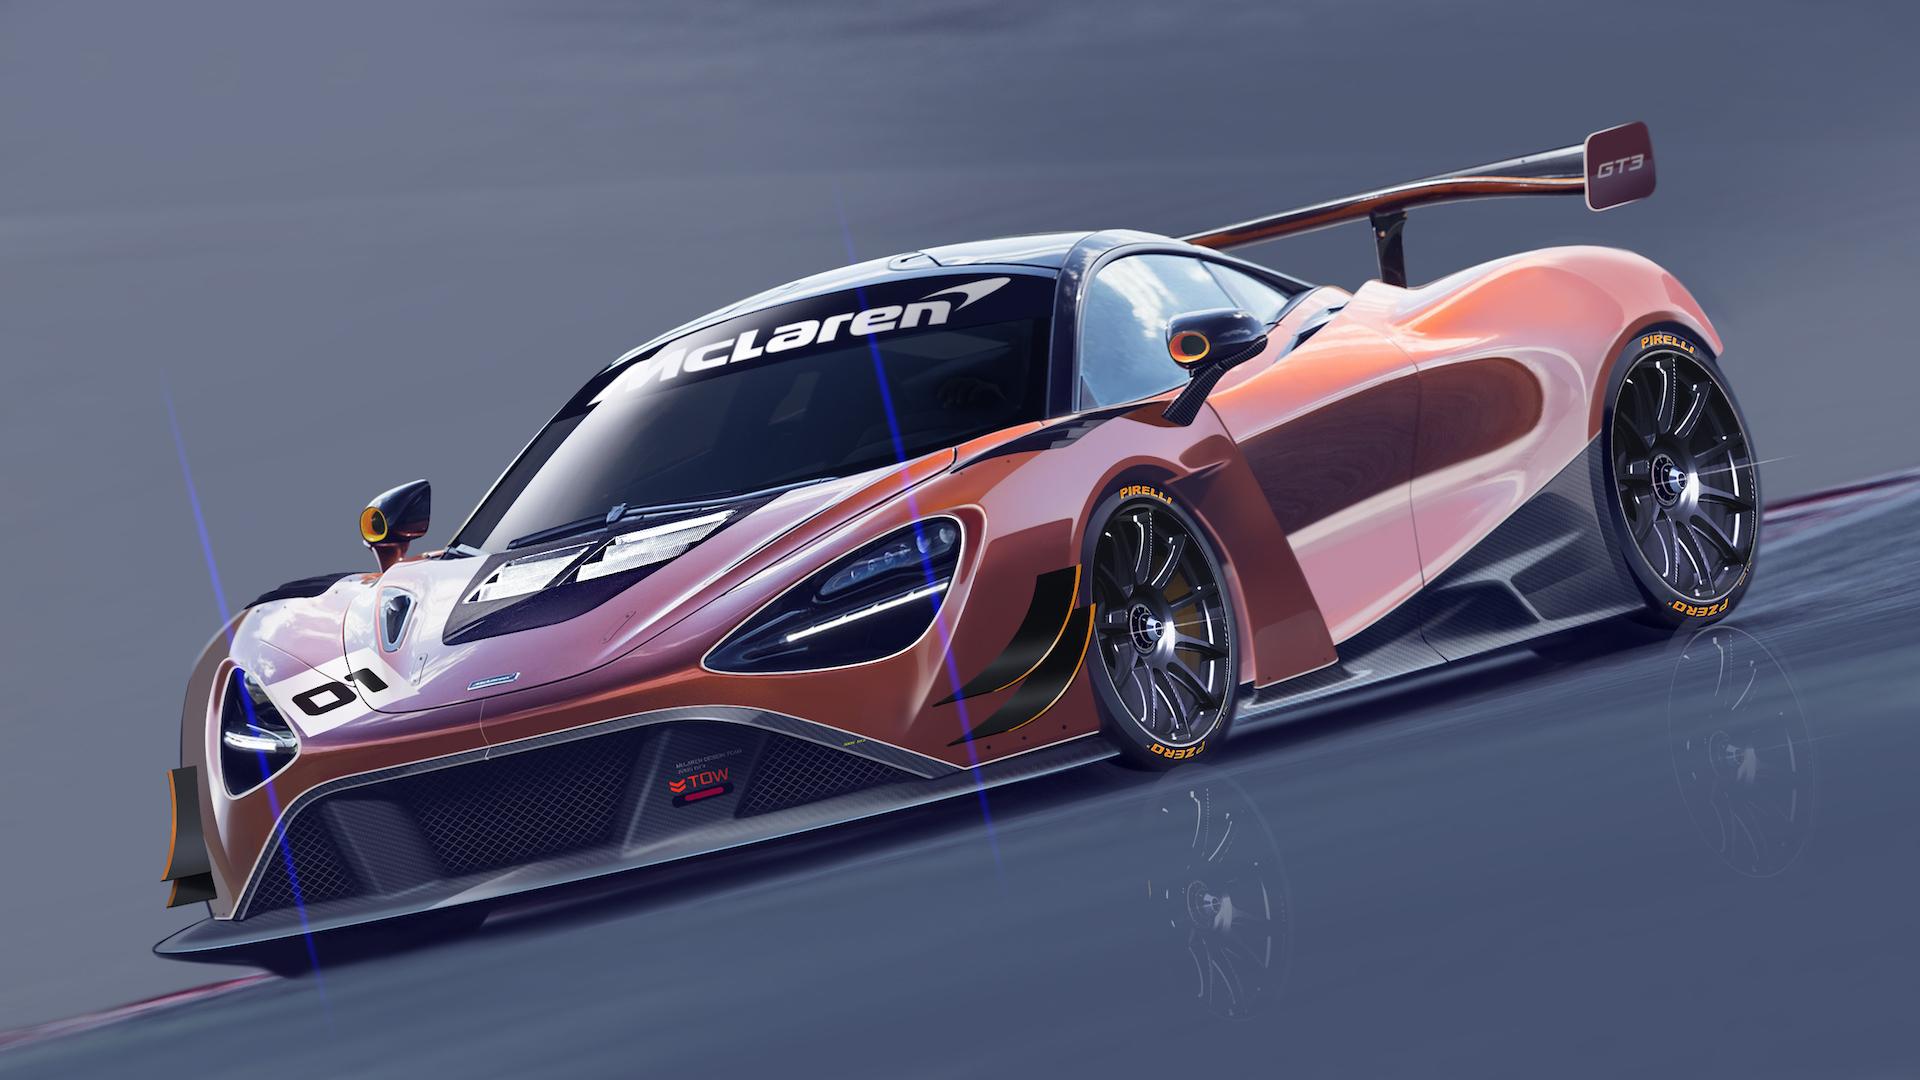 Mclaren To Launch One Make Racing Series In 2018 New 720s